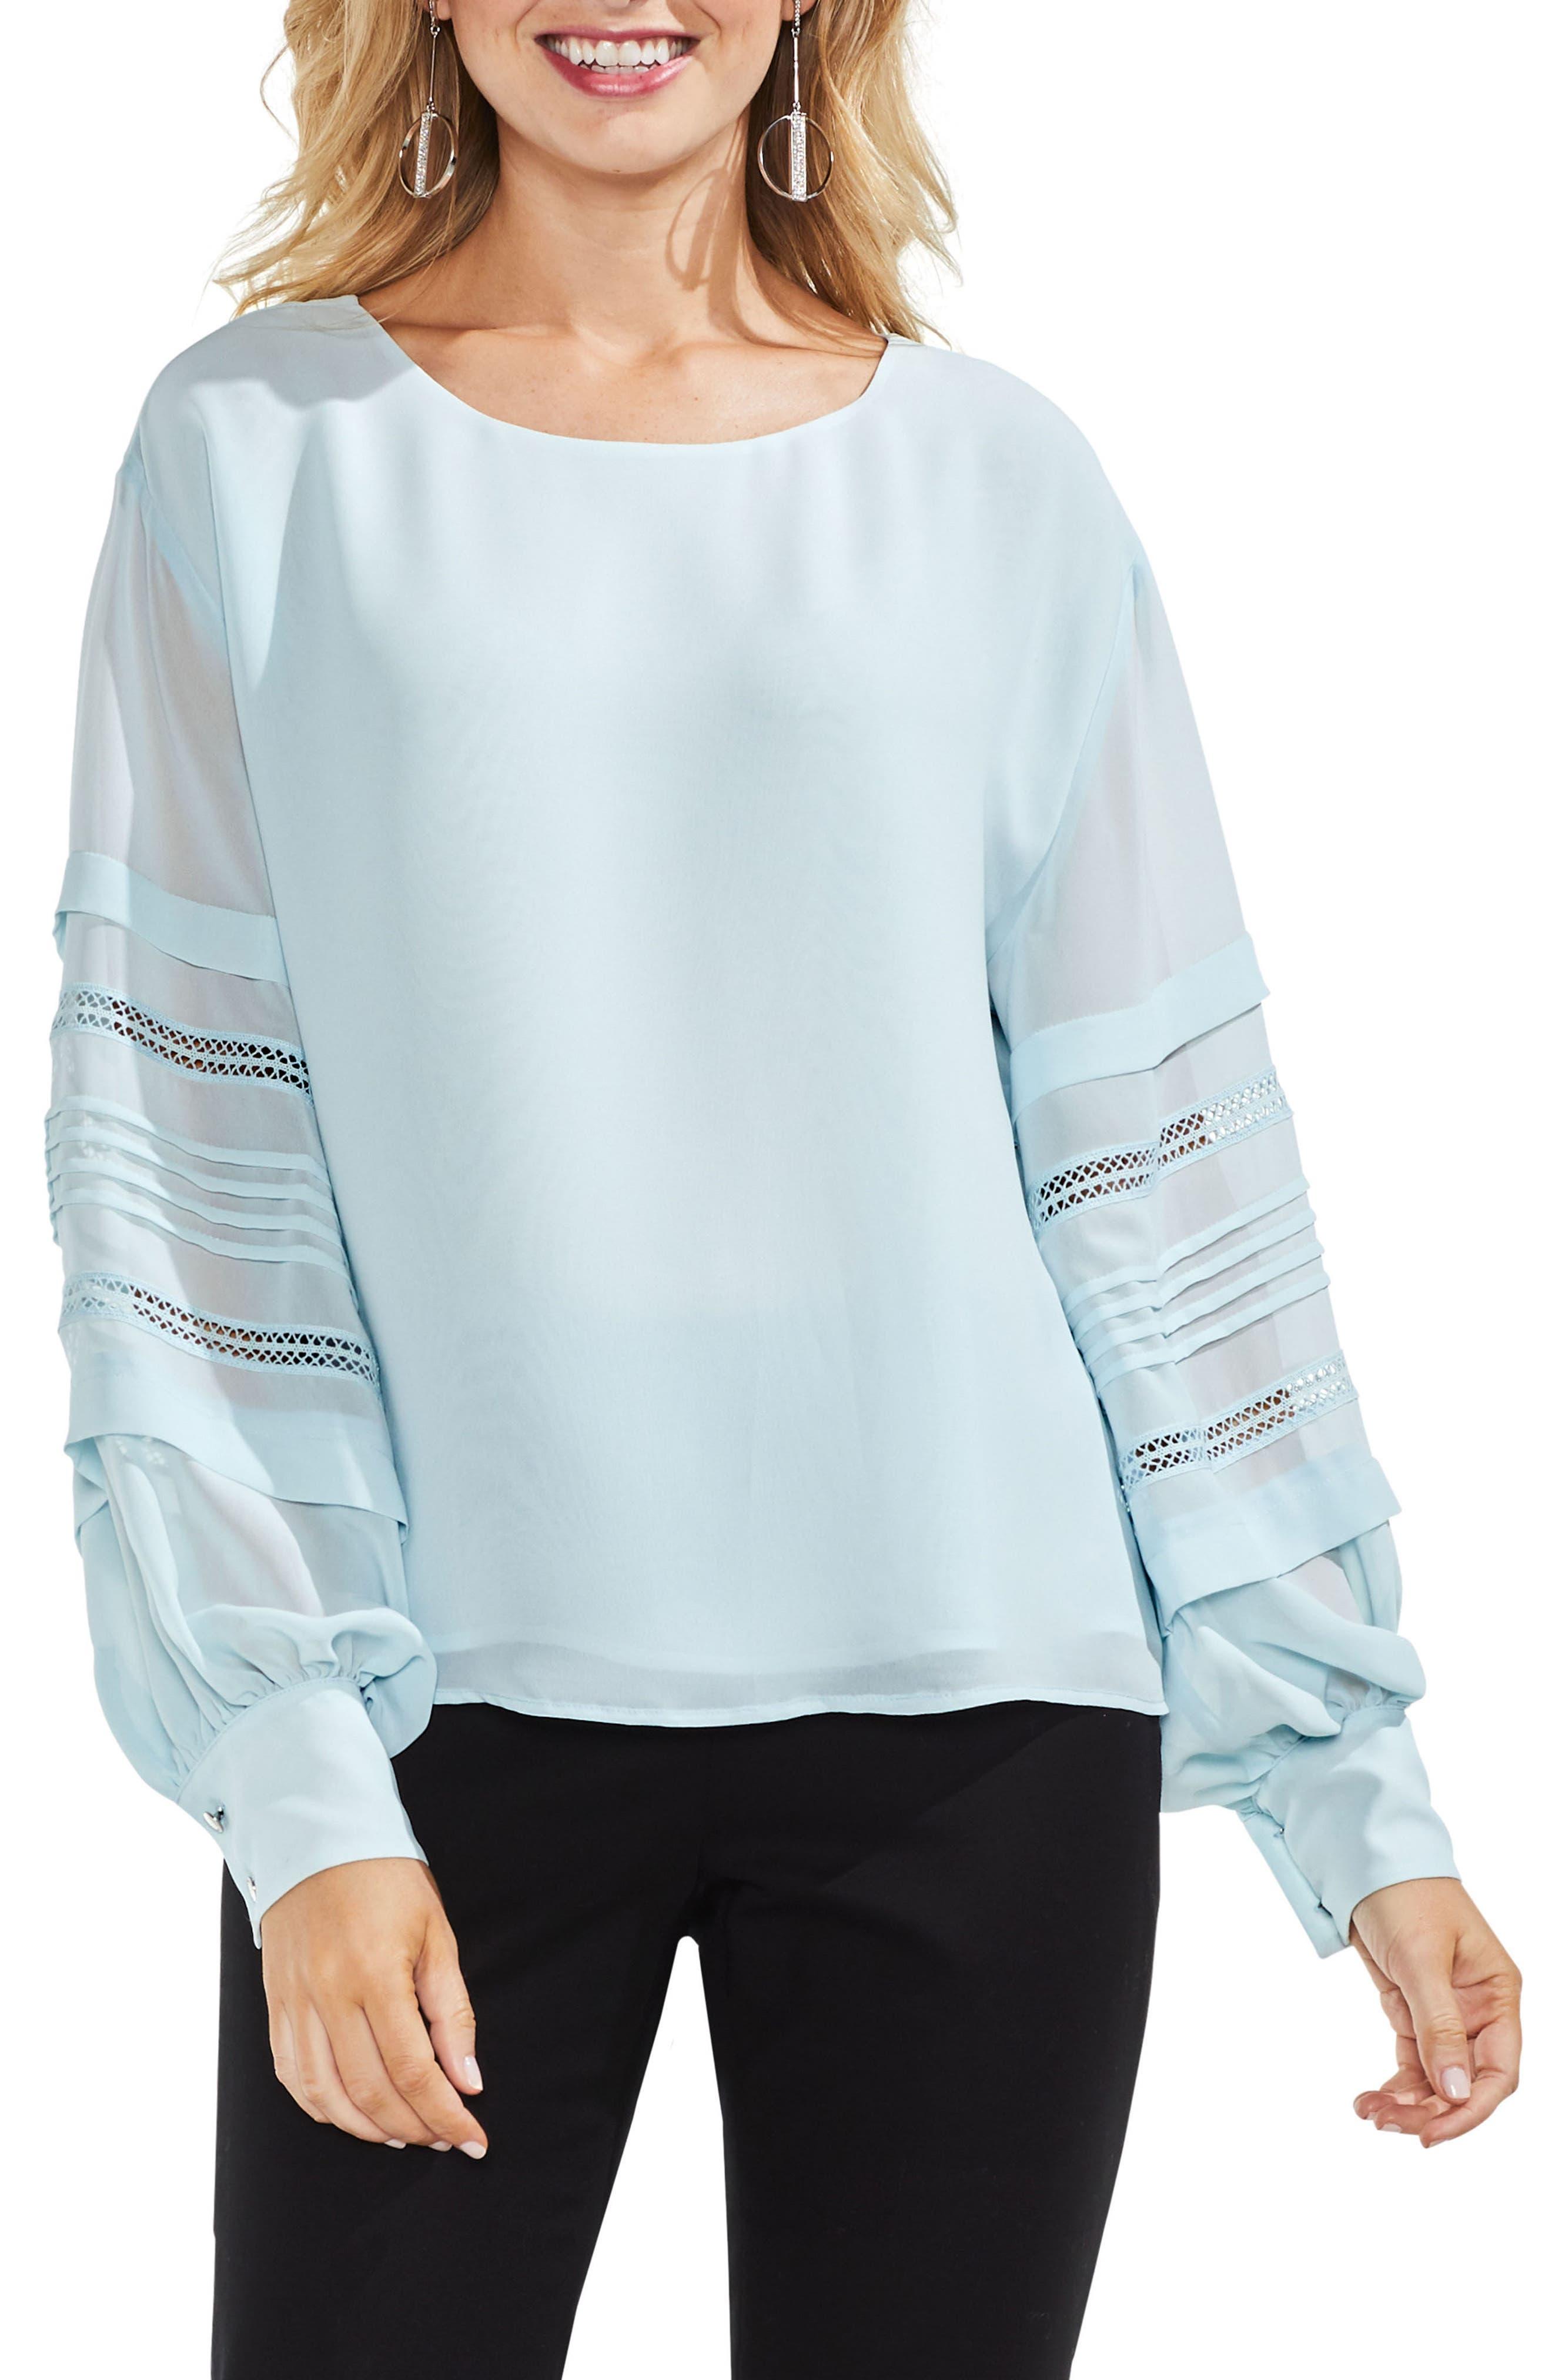 Pintuck Sleeve Blouse,                             Main thumbnail 1, color,                             Chalk Blue